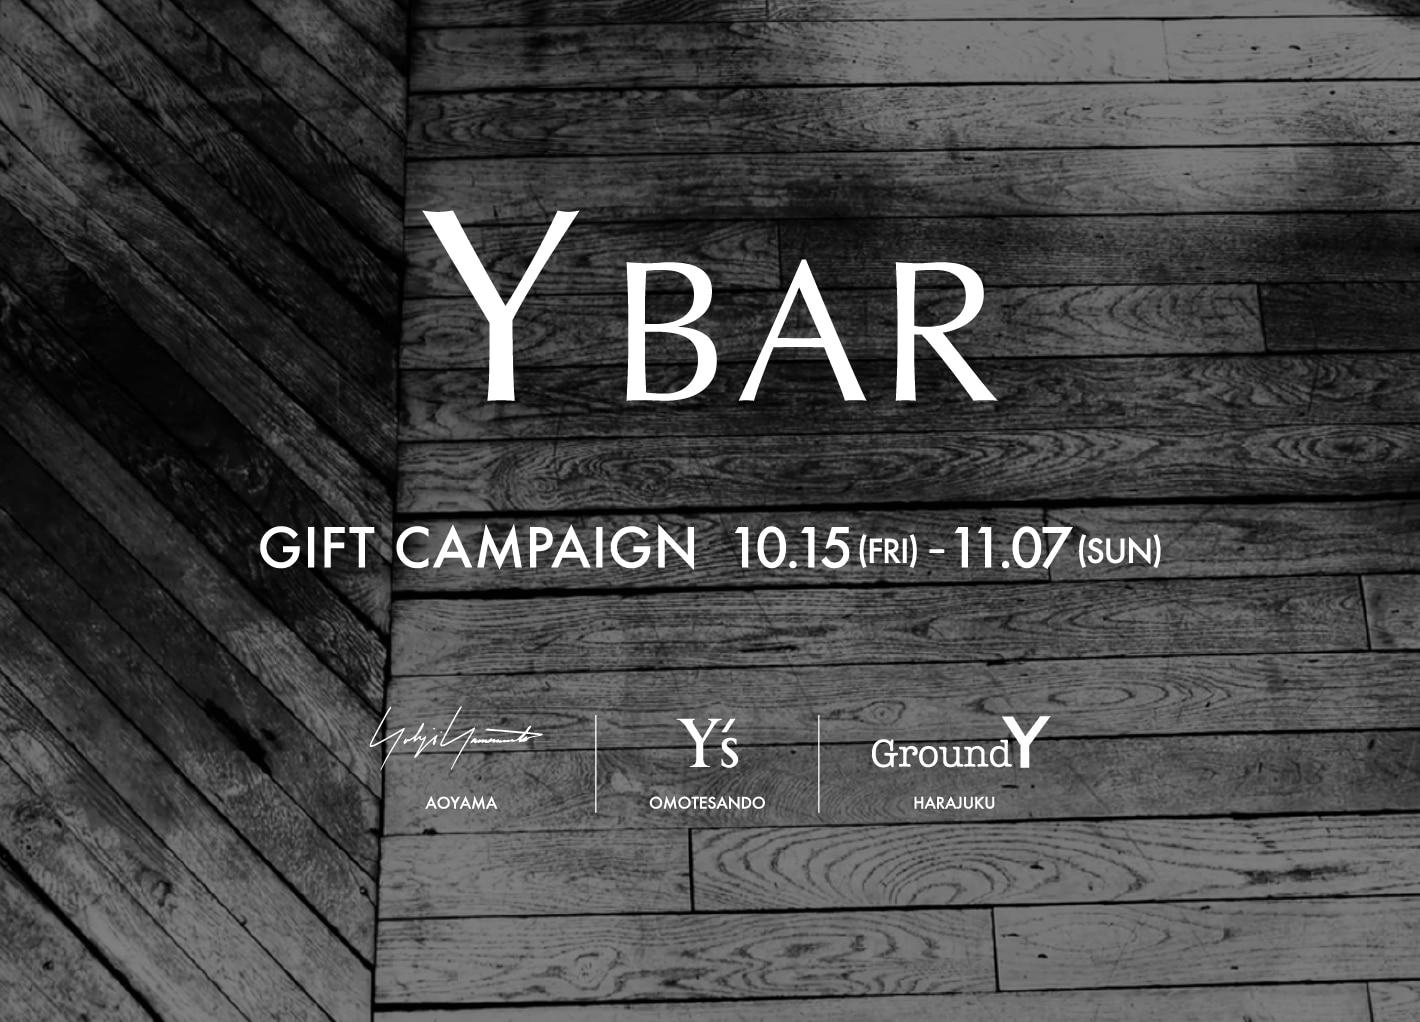 YBAR GIFT CAMPAIGN